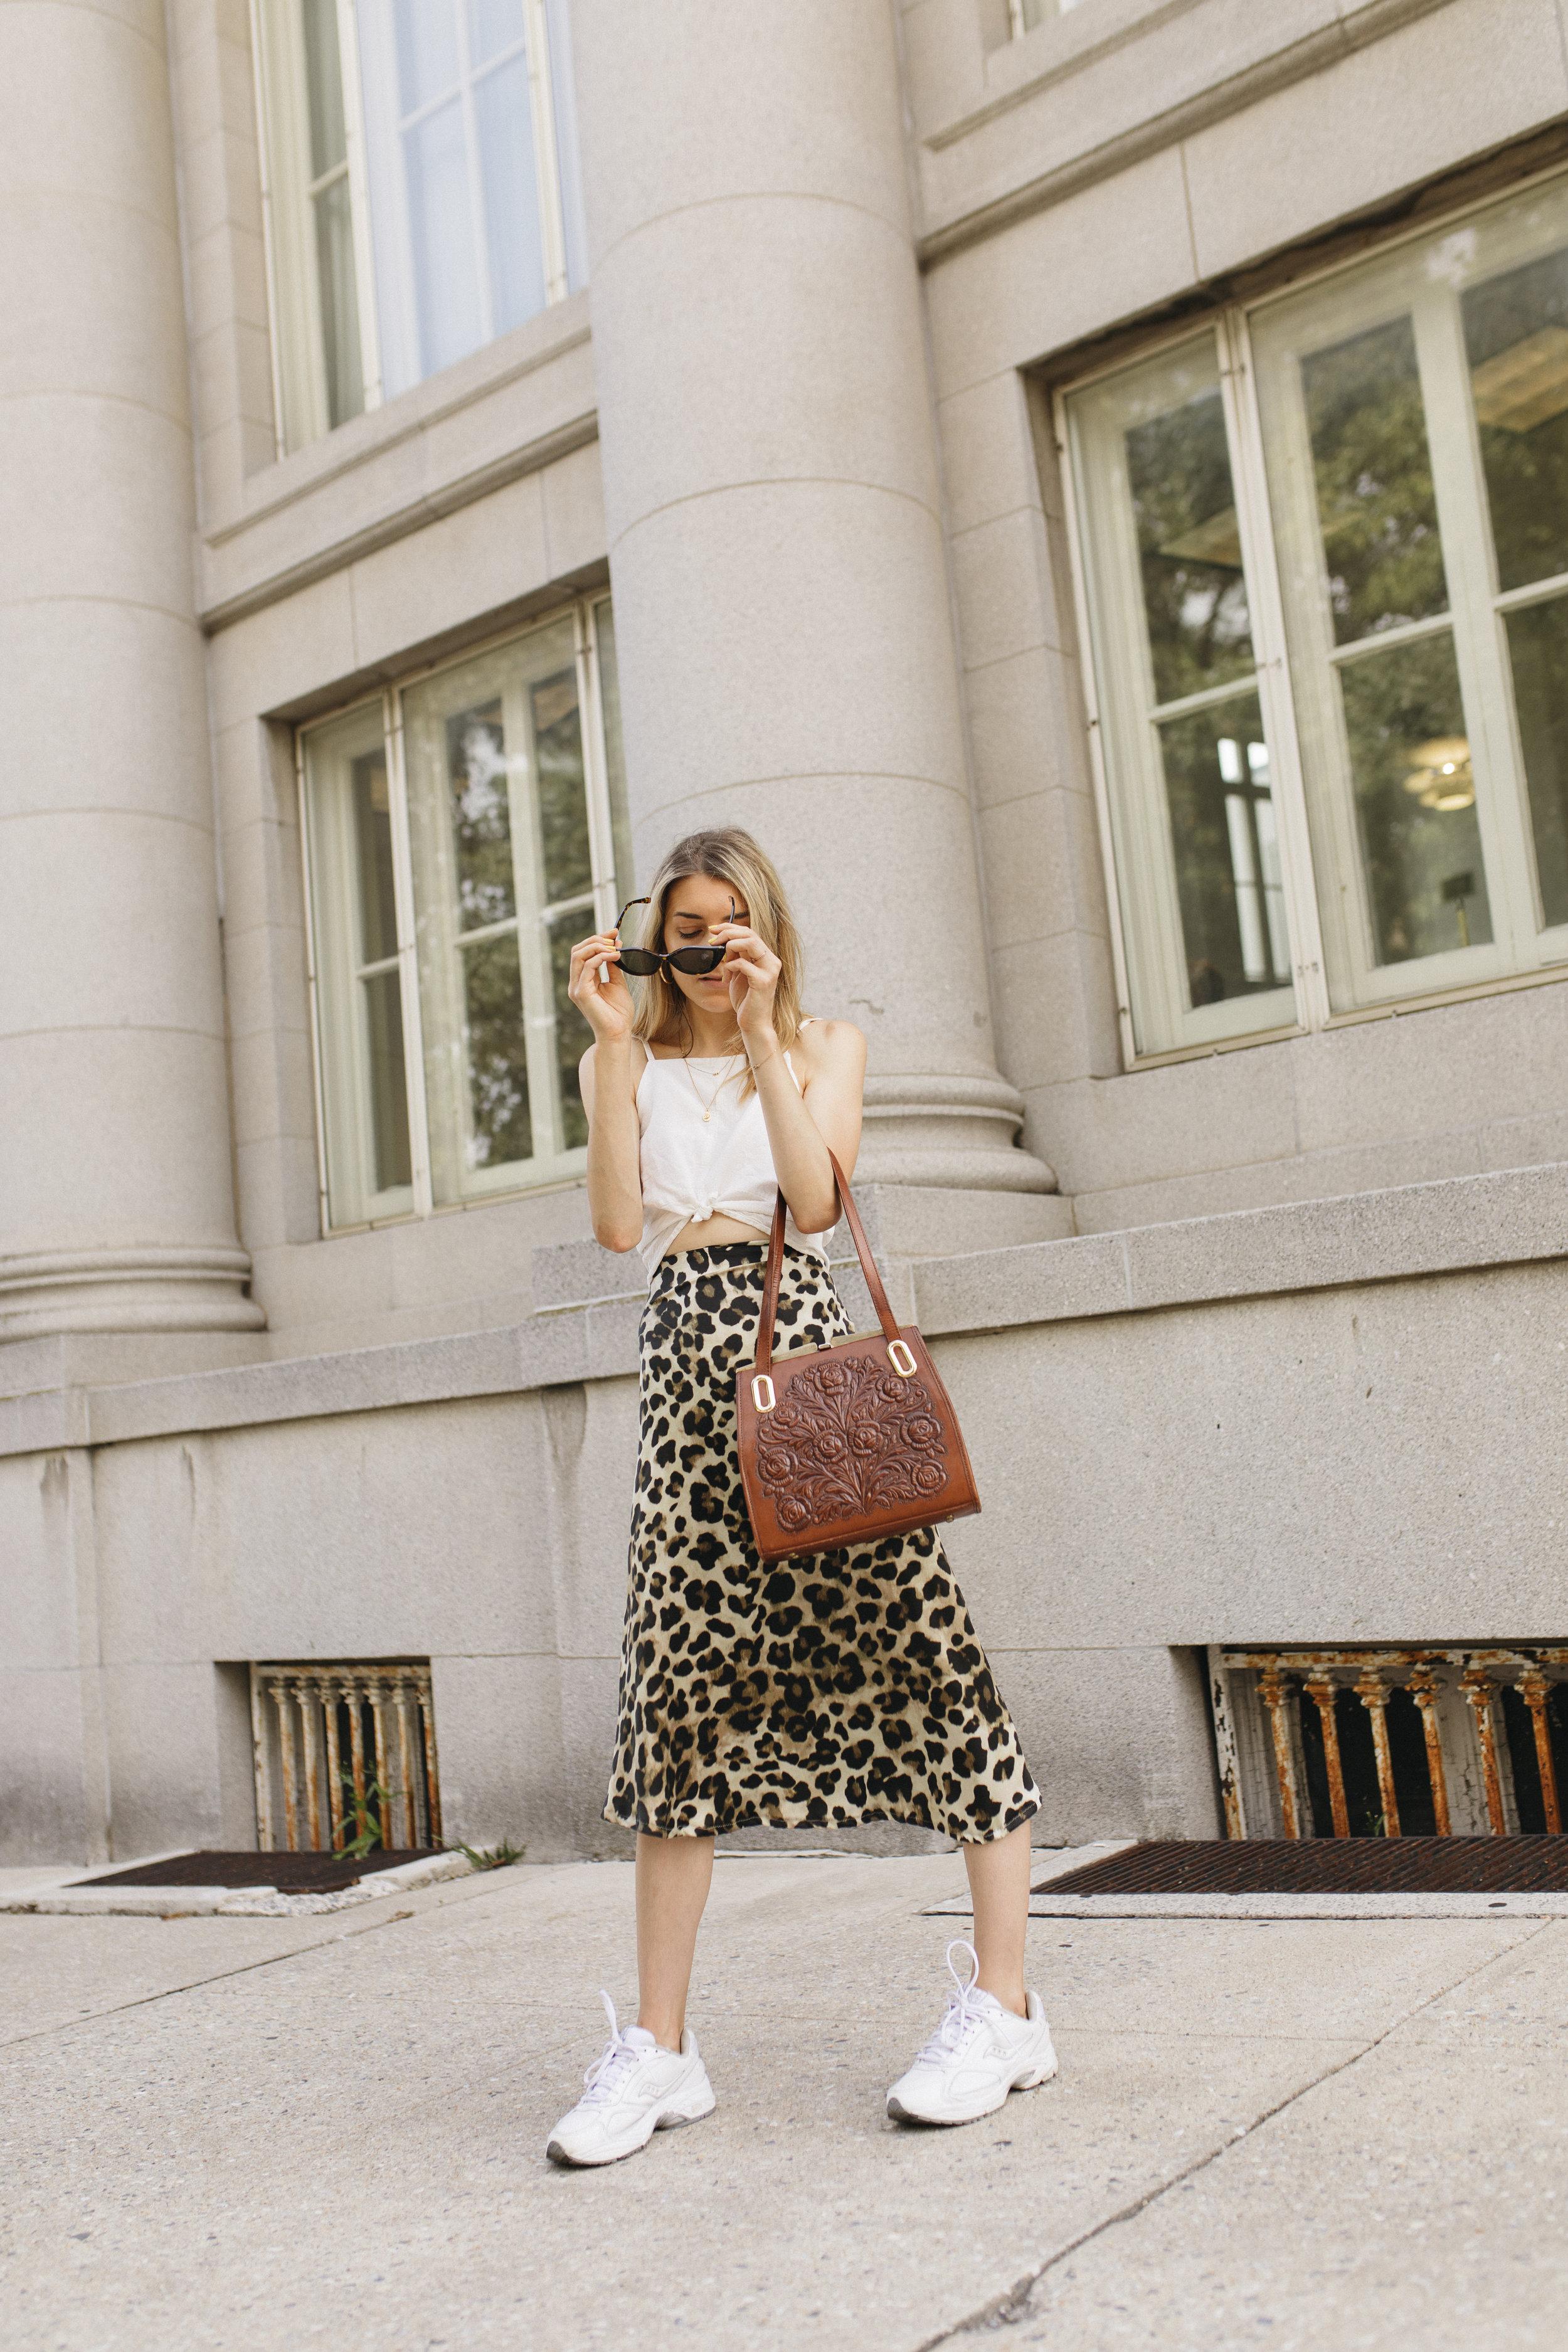 emilyrhess-blog-trends-fashion-leopard-cheetah-skirt-diy-naomi11.jpg